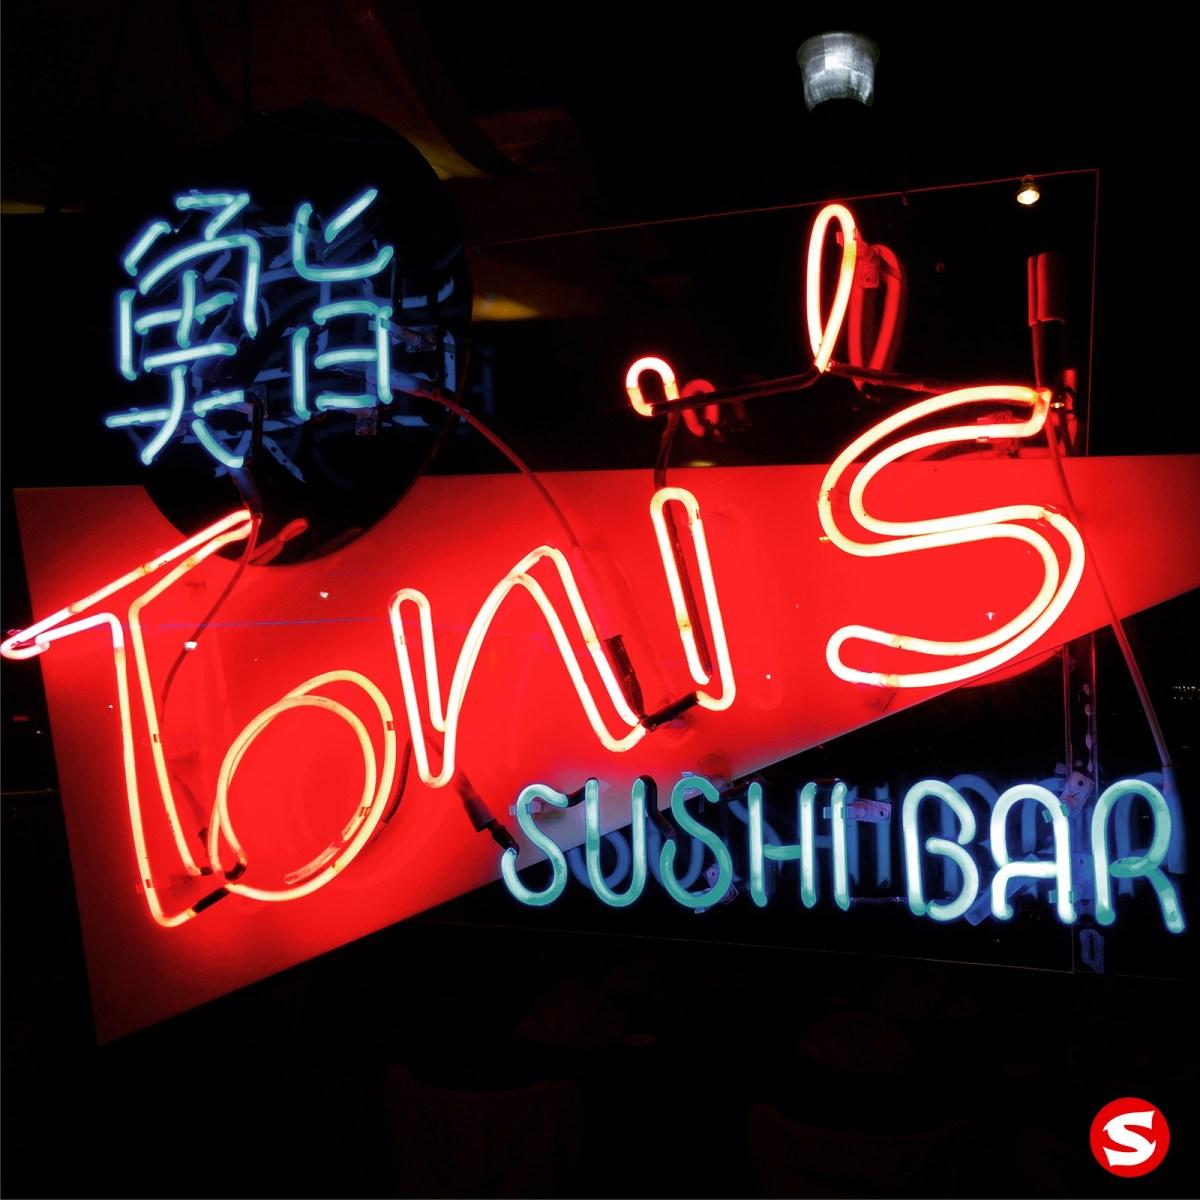 Toni's Sushi Bar - sign